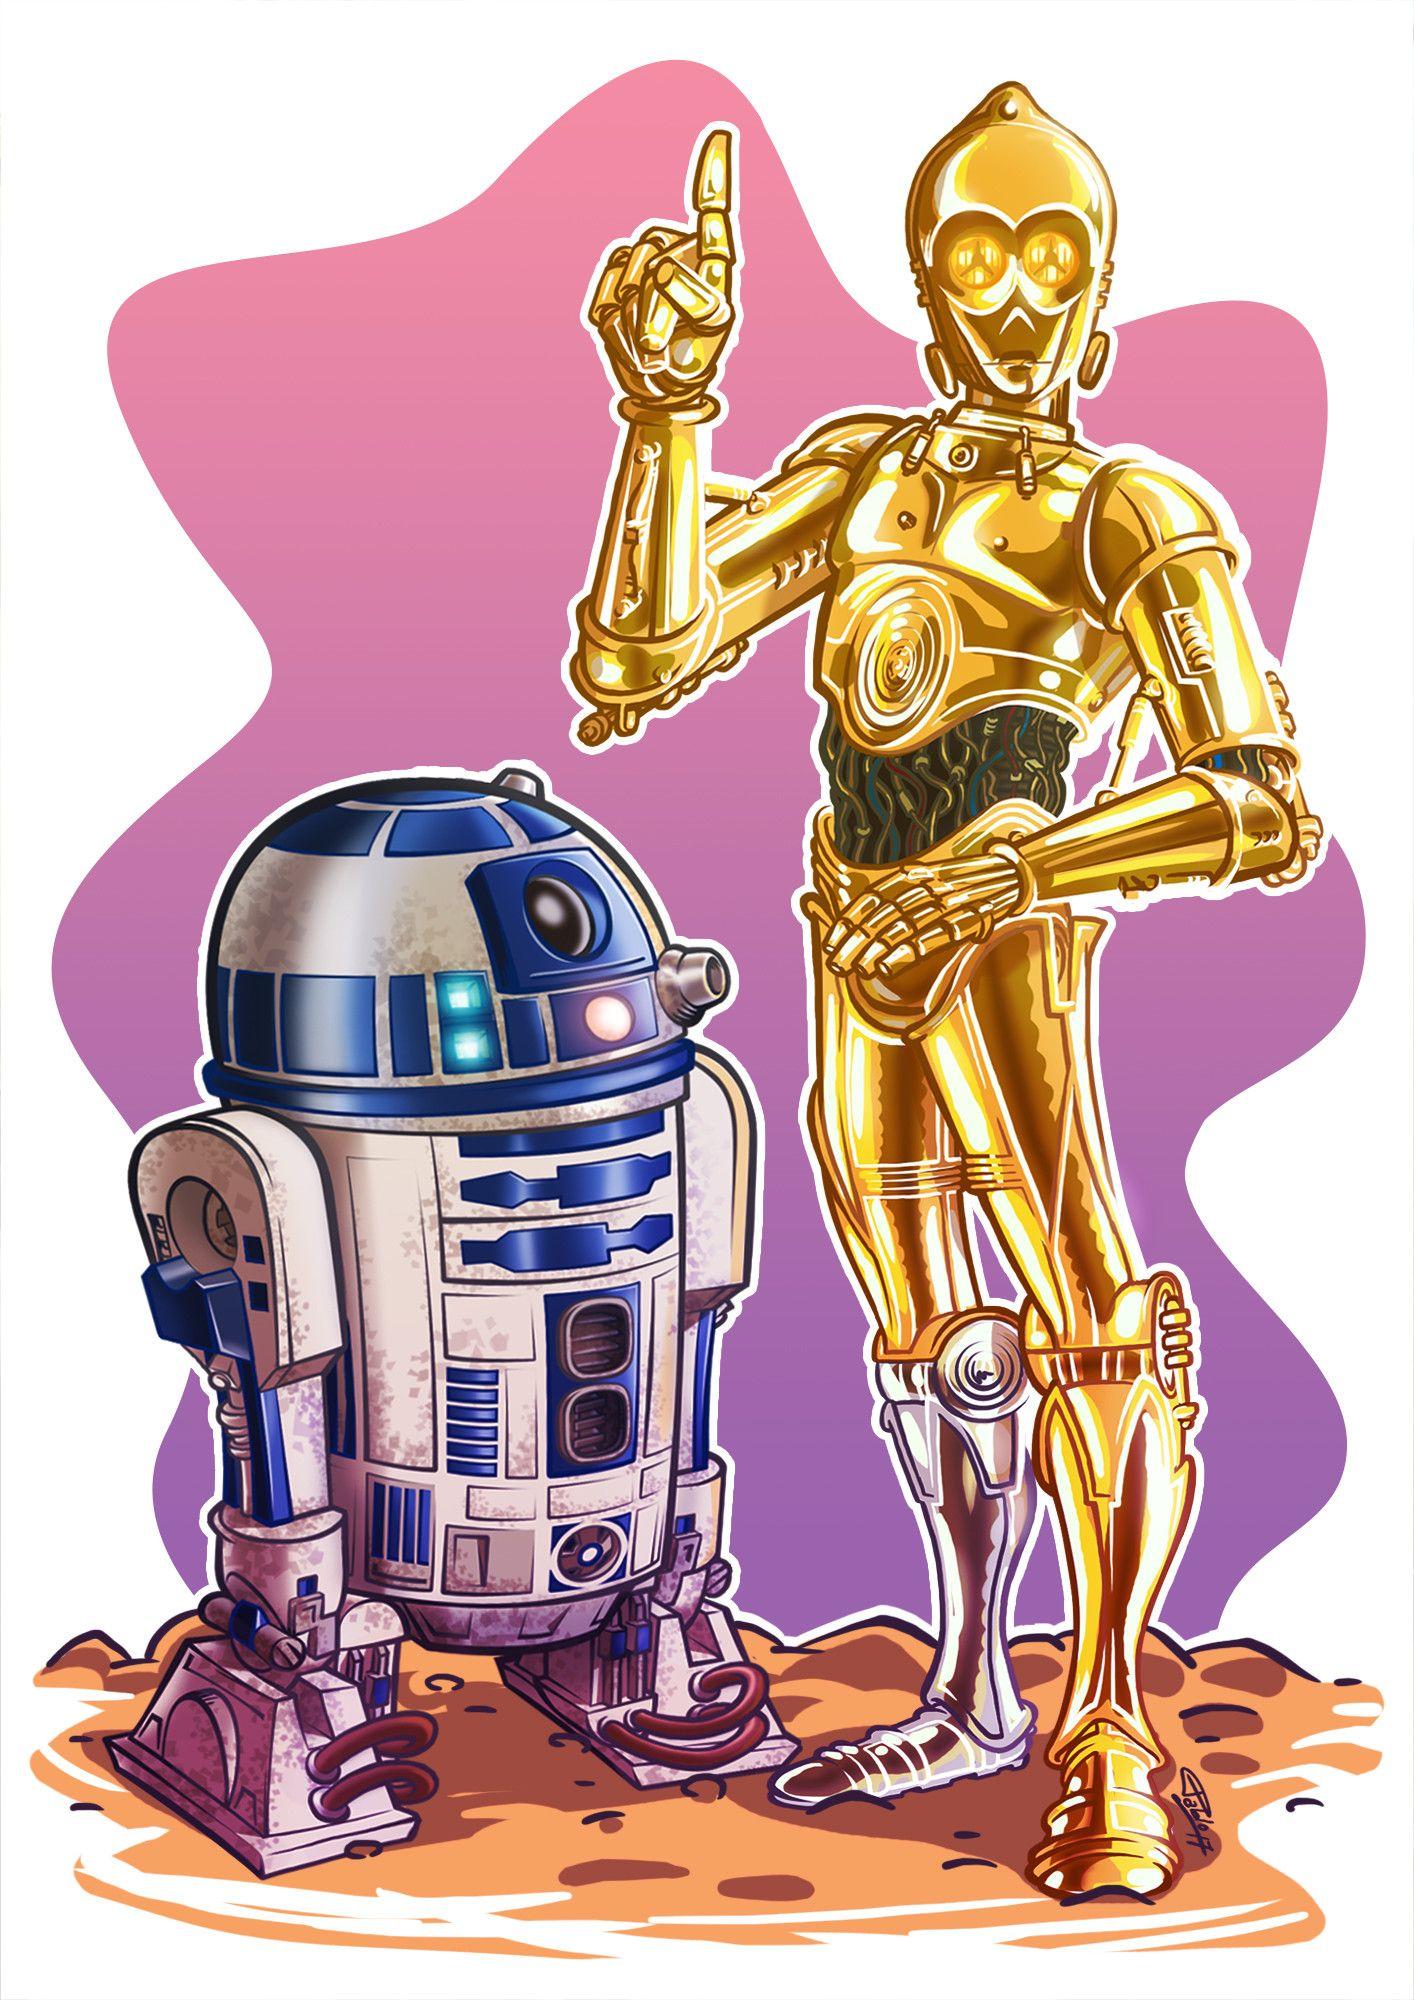 R2d2 And C3po Pablo Andreetta Star Wars Fan Art Star Wars Collectors Star Wars Characters